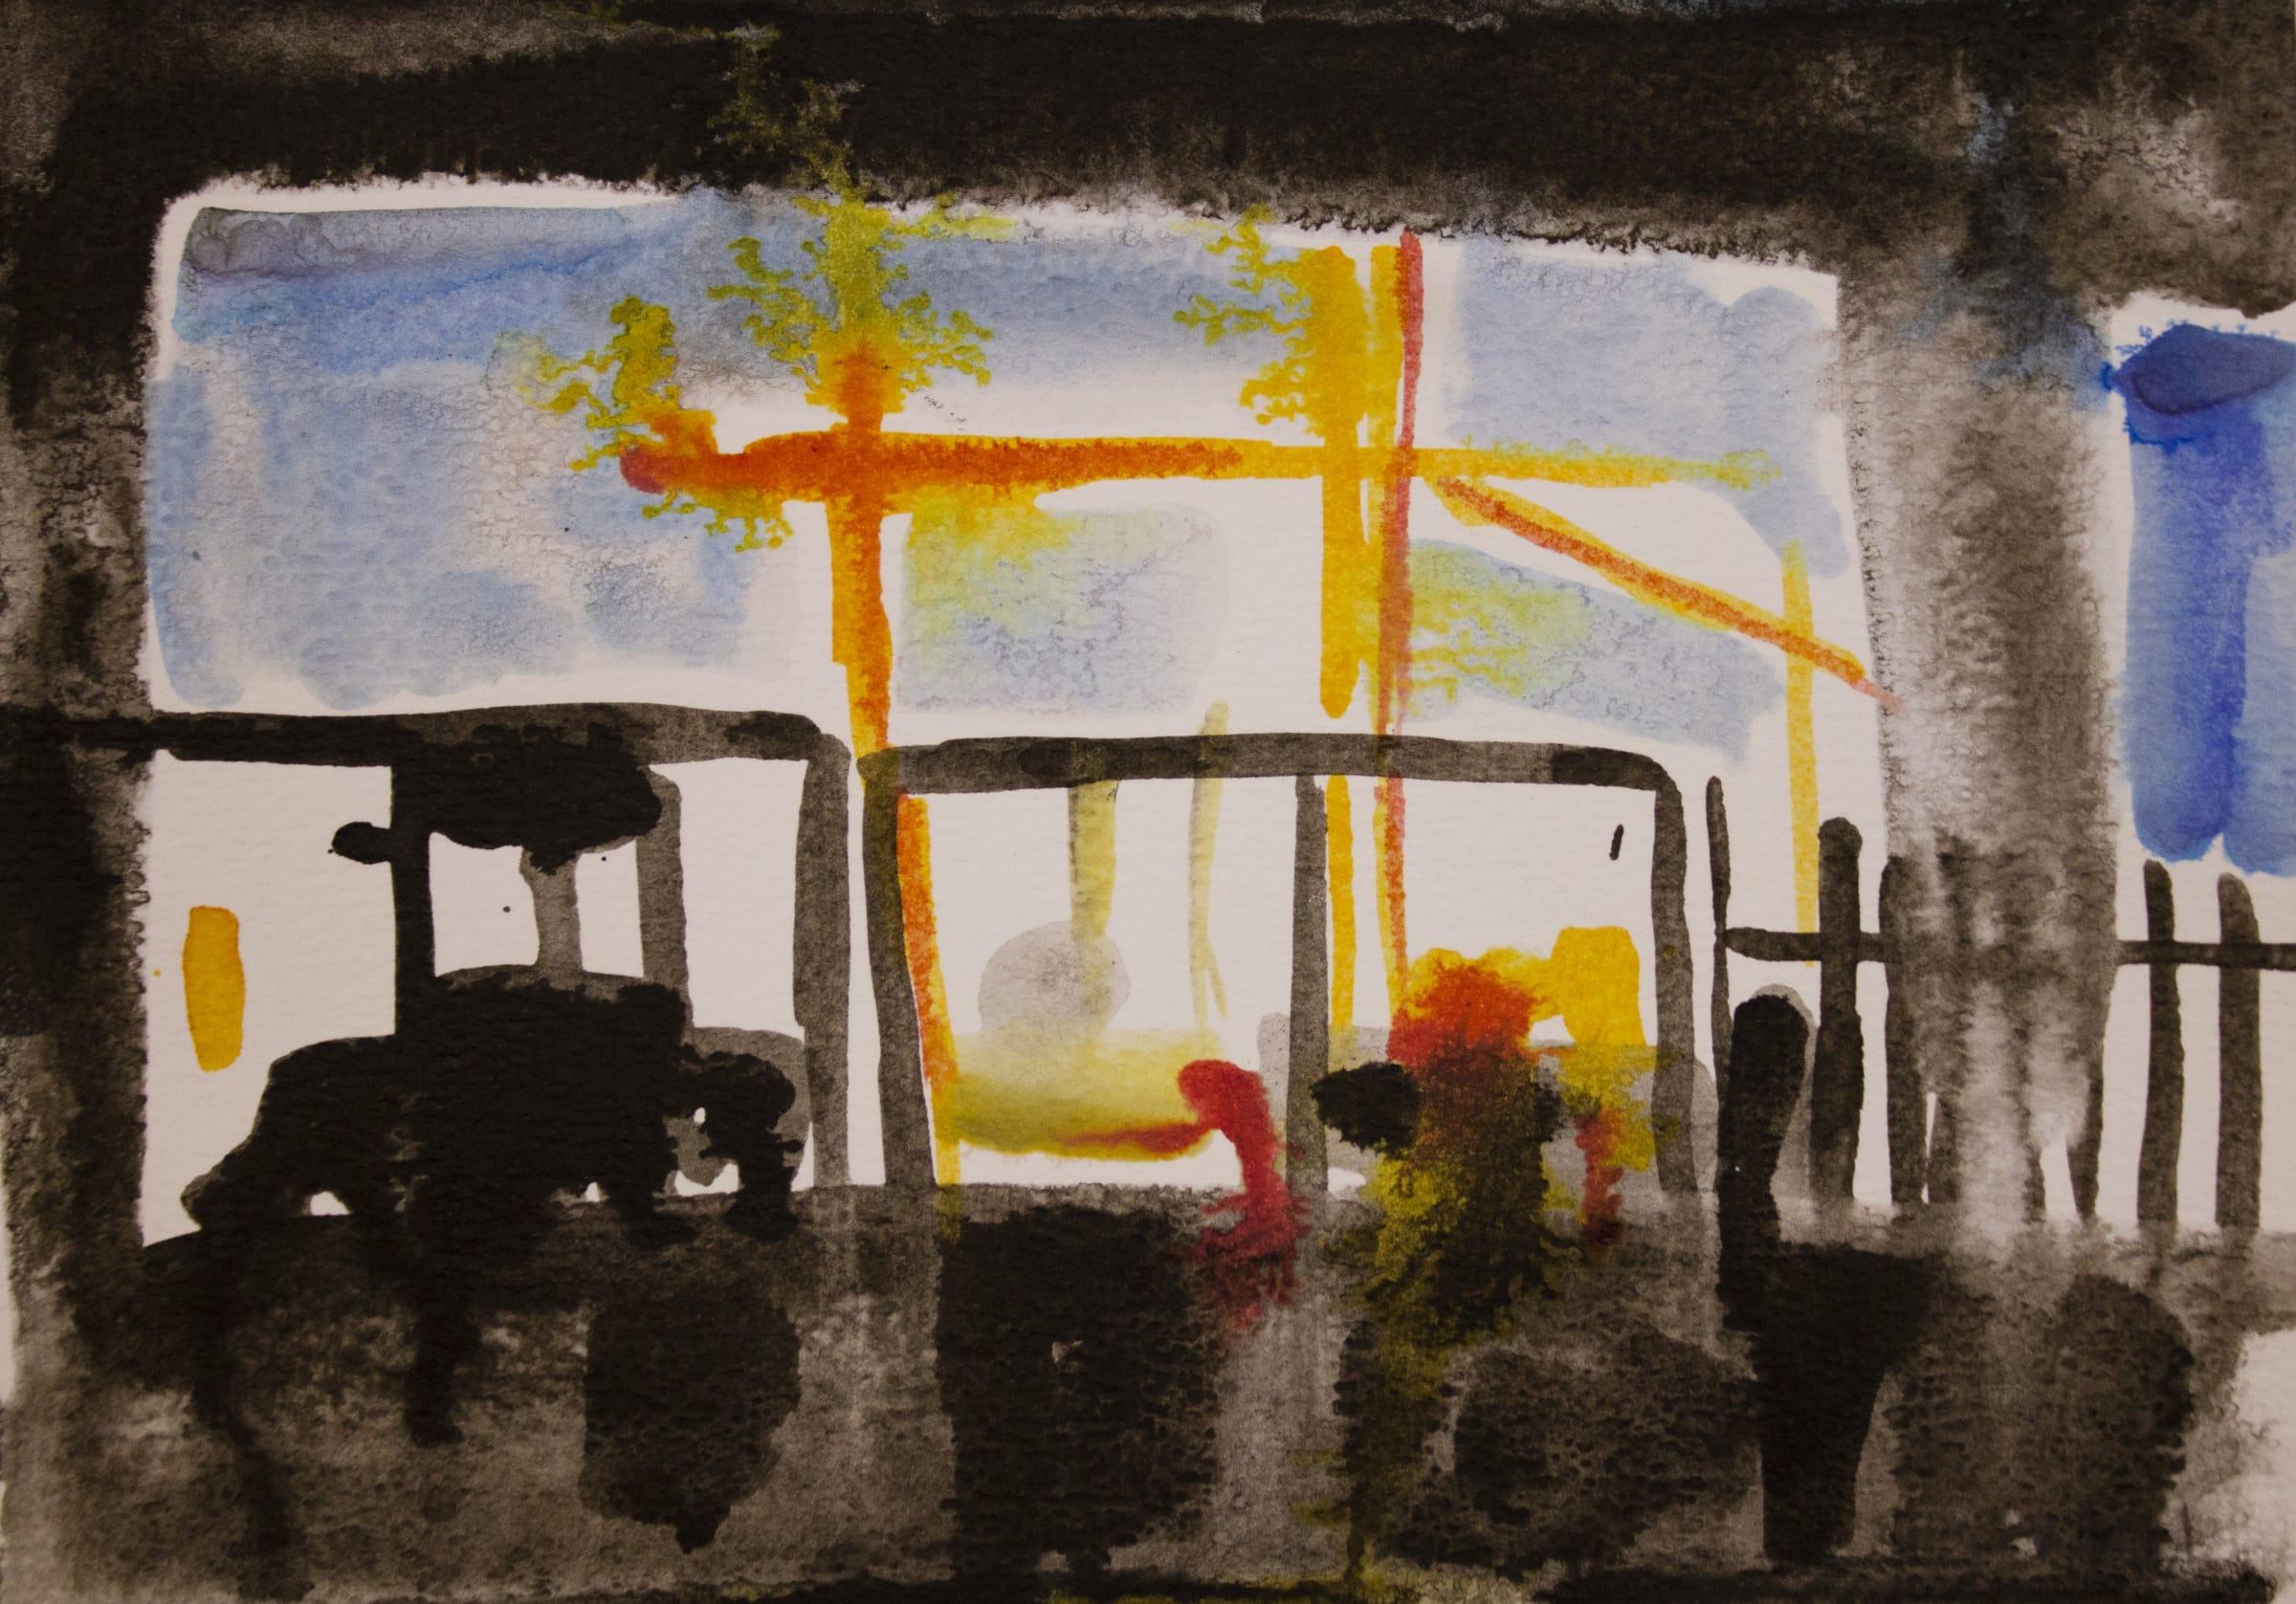 <span class=&#34;link fancybox-details-link&#34;><a href=&#34;/artists/88-louise-van-der-bijl/works/2273-louise-van-der-bijl-inktober-day-11-2018/&#34;>View Detail Page</a></span><div class=&#34;artist&#34;><strong>Louise Van Der Bijl</strong></div> <div class=&#34;title&#34;><em>Inktober Day 11</em>, 2018</div> <div class=&#34;medium&#34;>Ink On Paper</div> <div class=&#34;dimensions&#34;>15.3cm x 21cm</div><div class=&#34;price&#34;>R400.00</div>